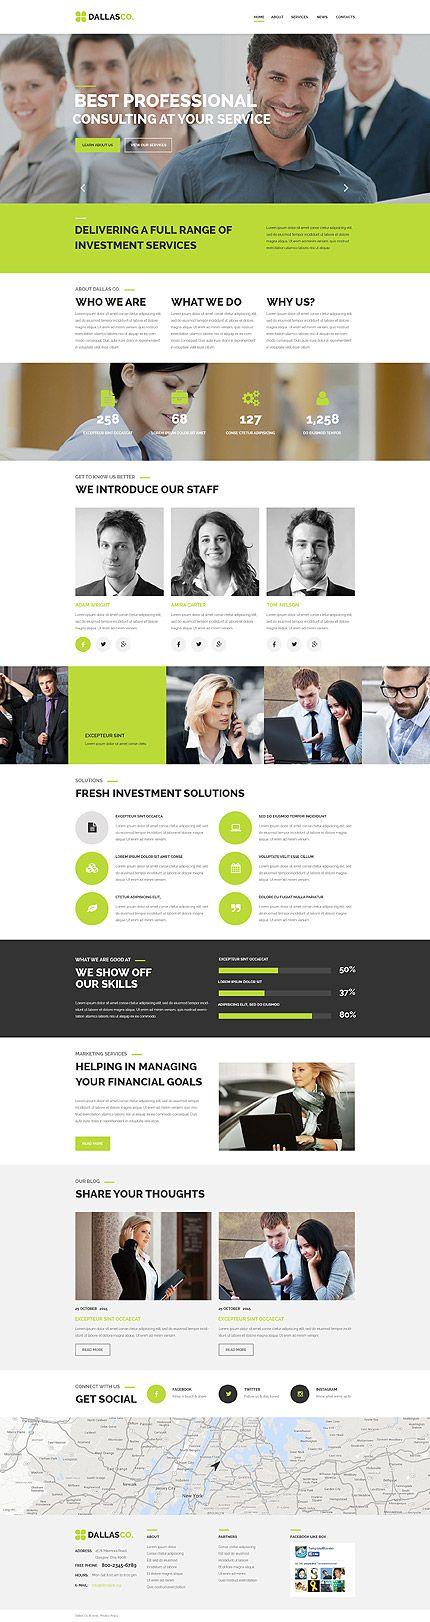 websites templates for sale